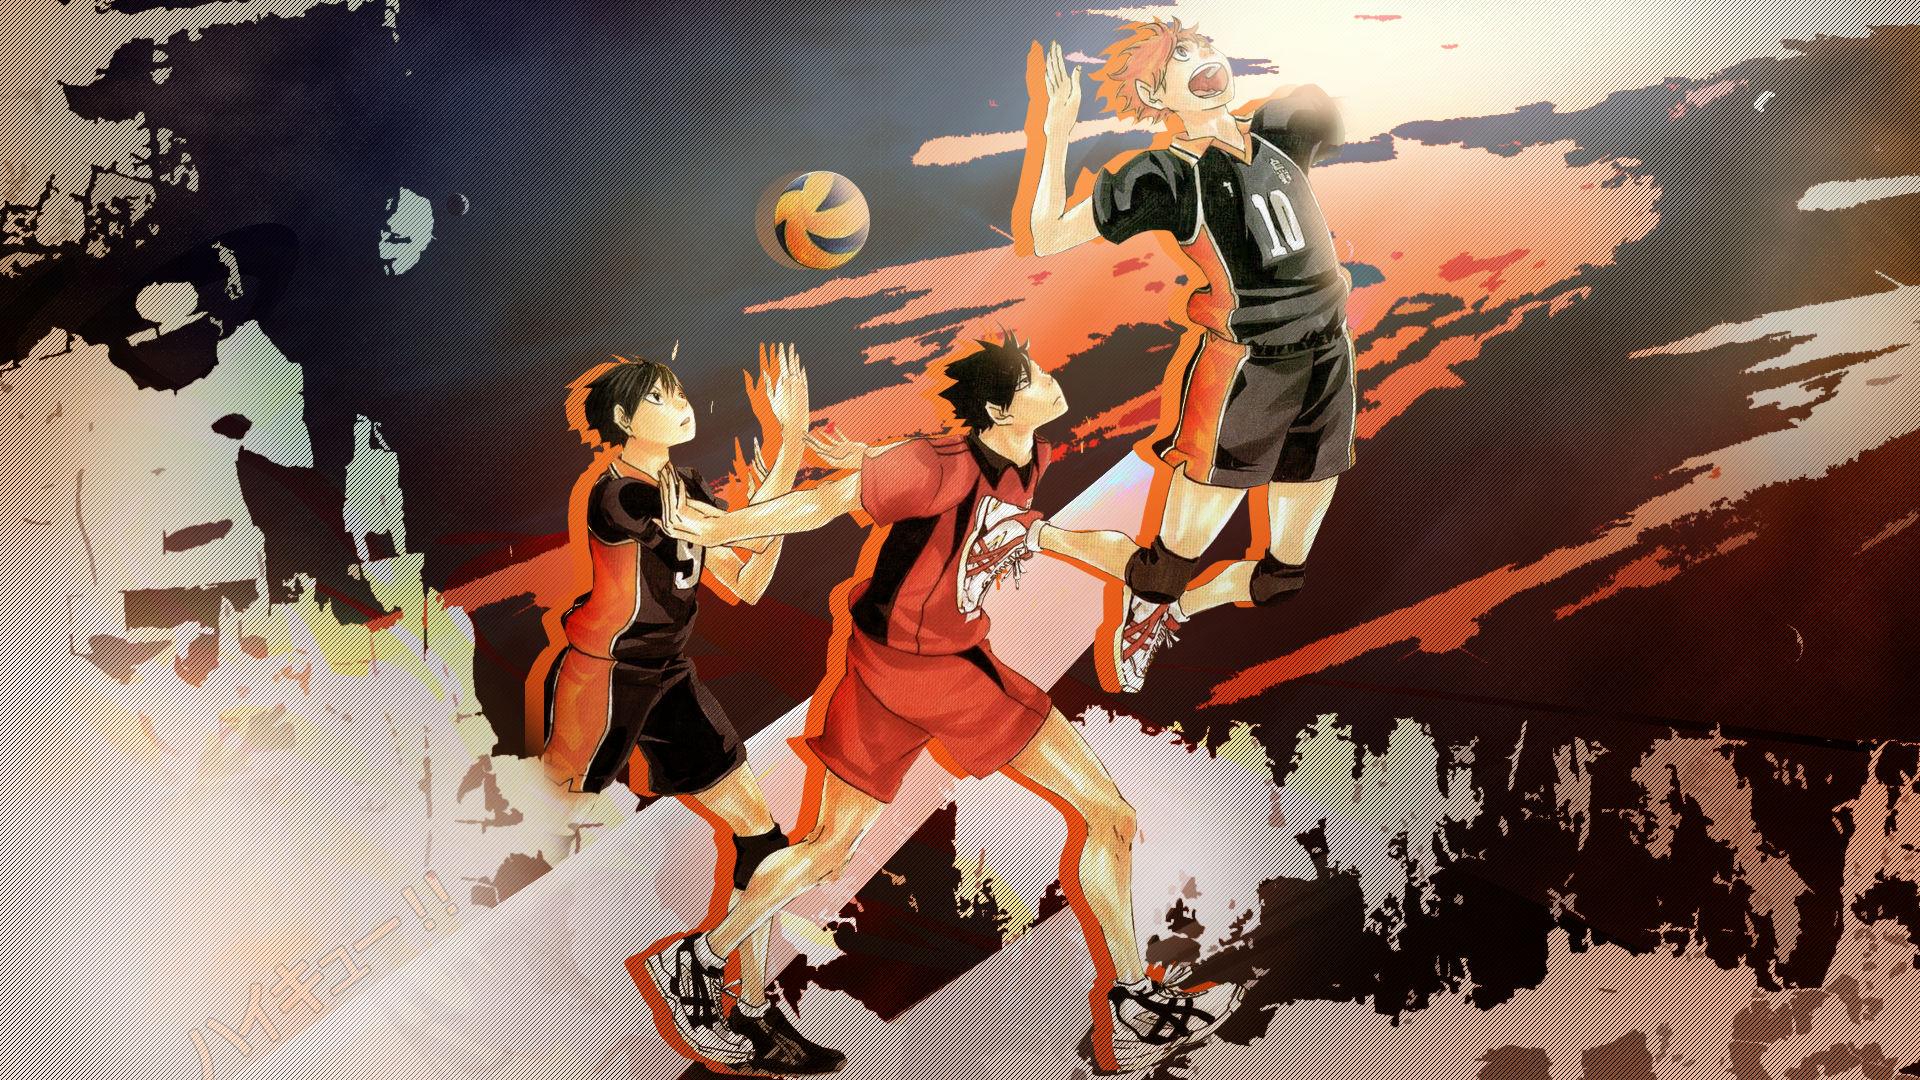 Haikyuu Anime HD Wallpaper Haikyuu anime Anime artwork 1920x1080